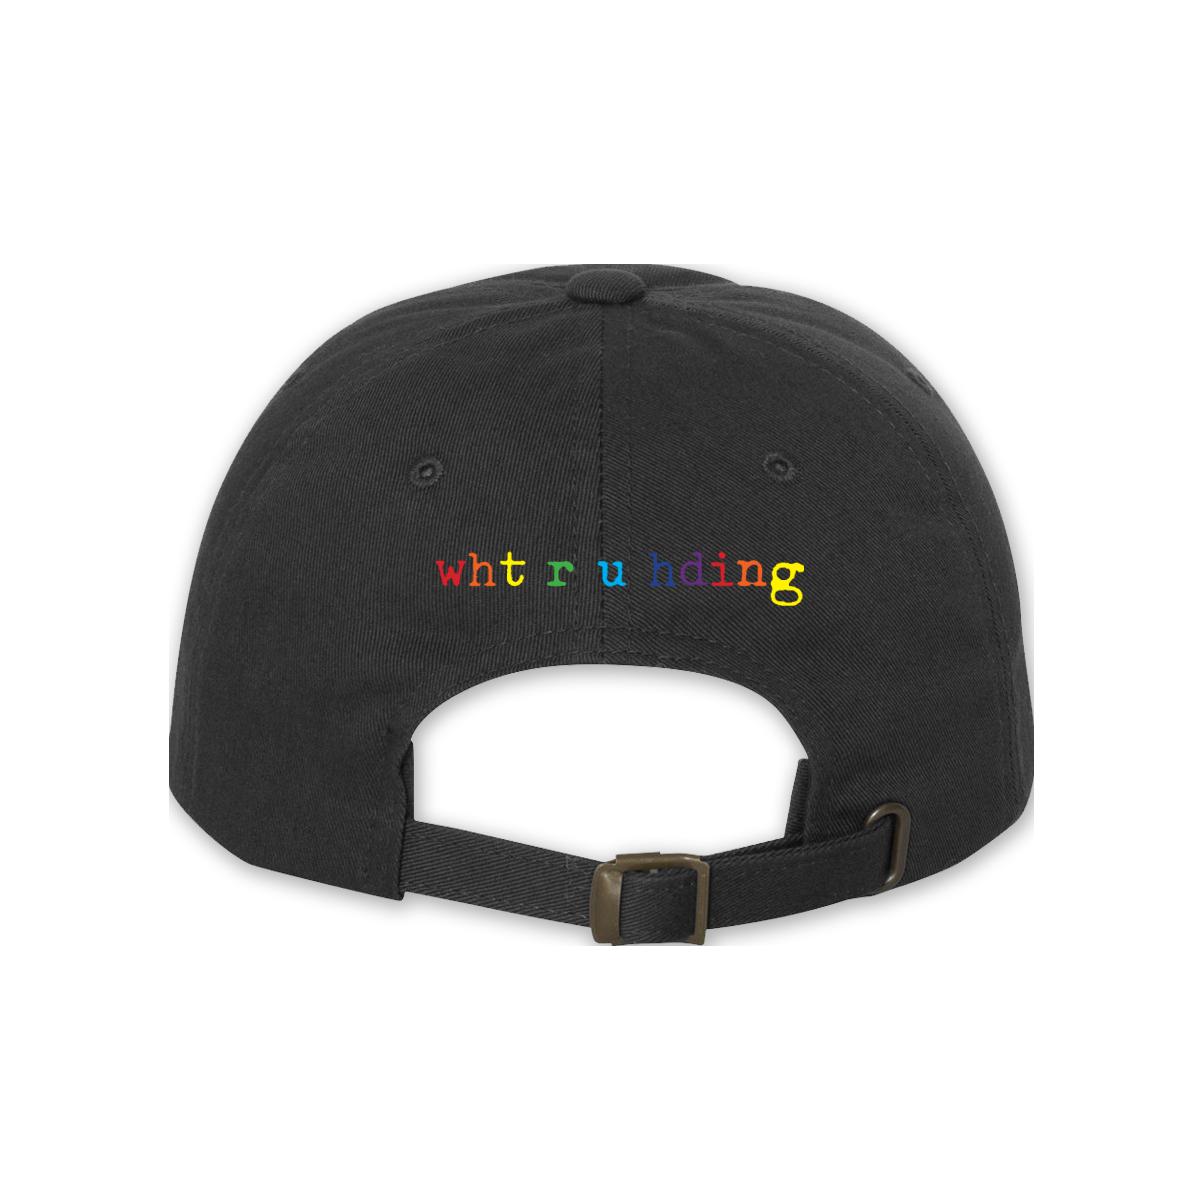 BLKBX: wht r u hding Hat